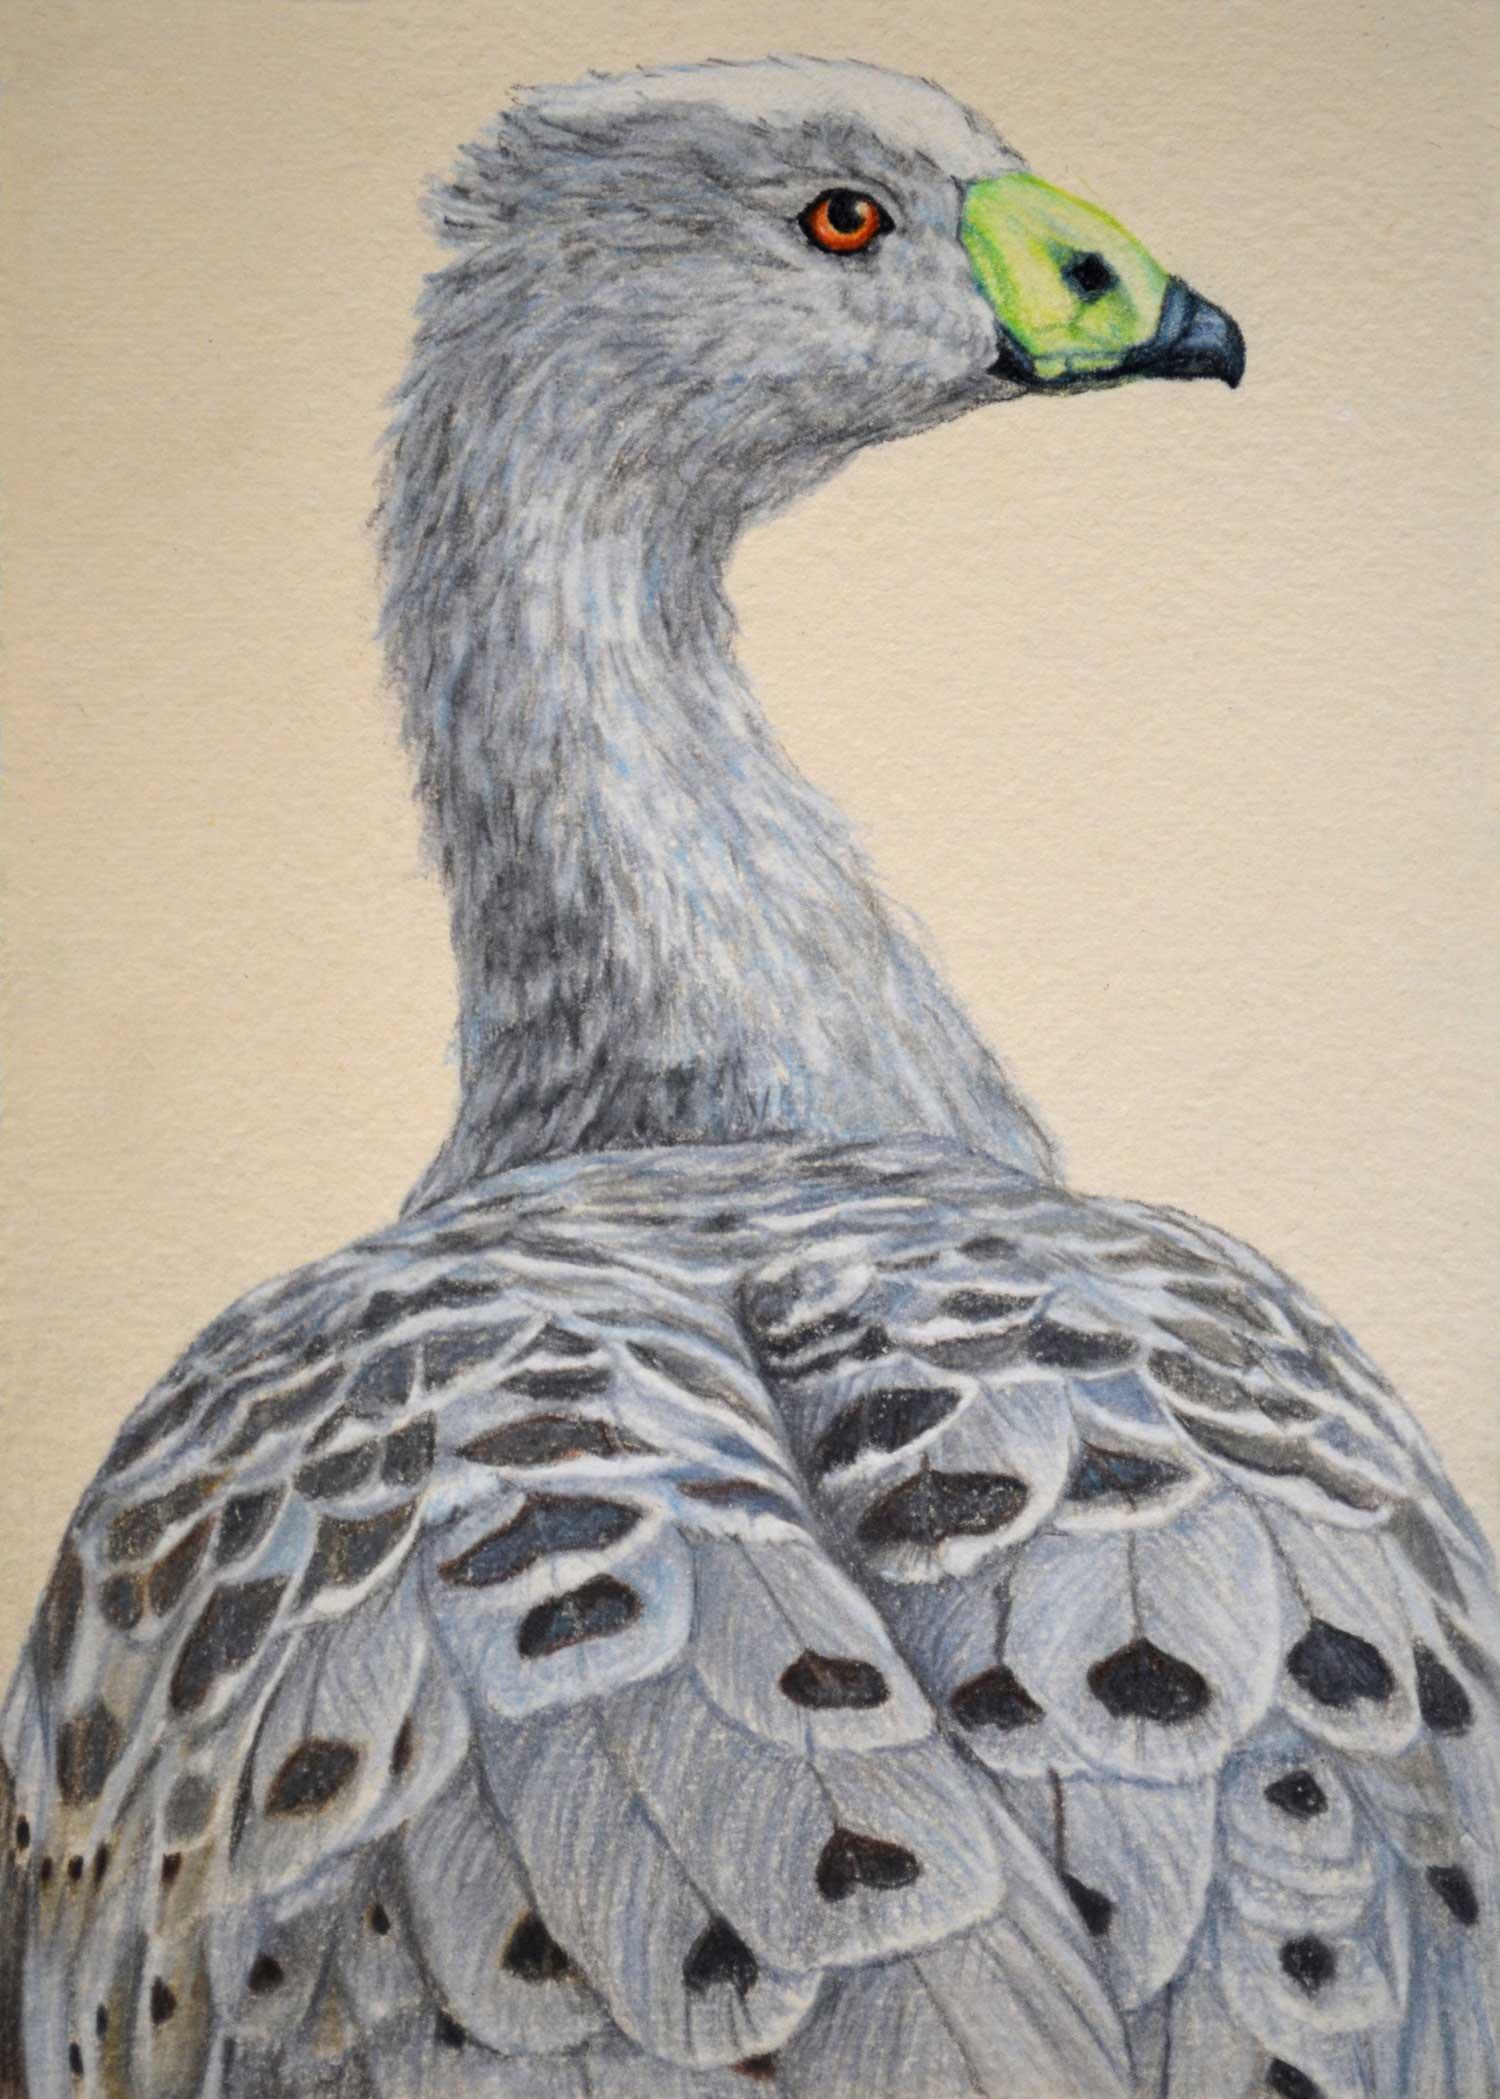 cape-barren-goose-2-drawing-rachel-newling.jpg